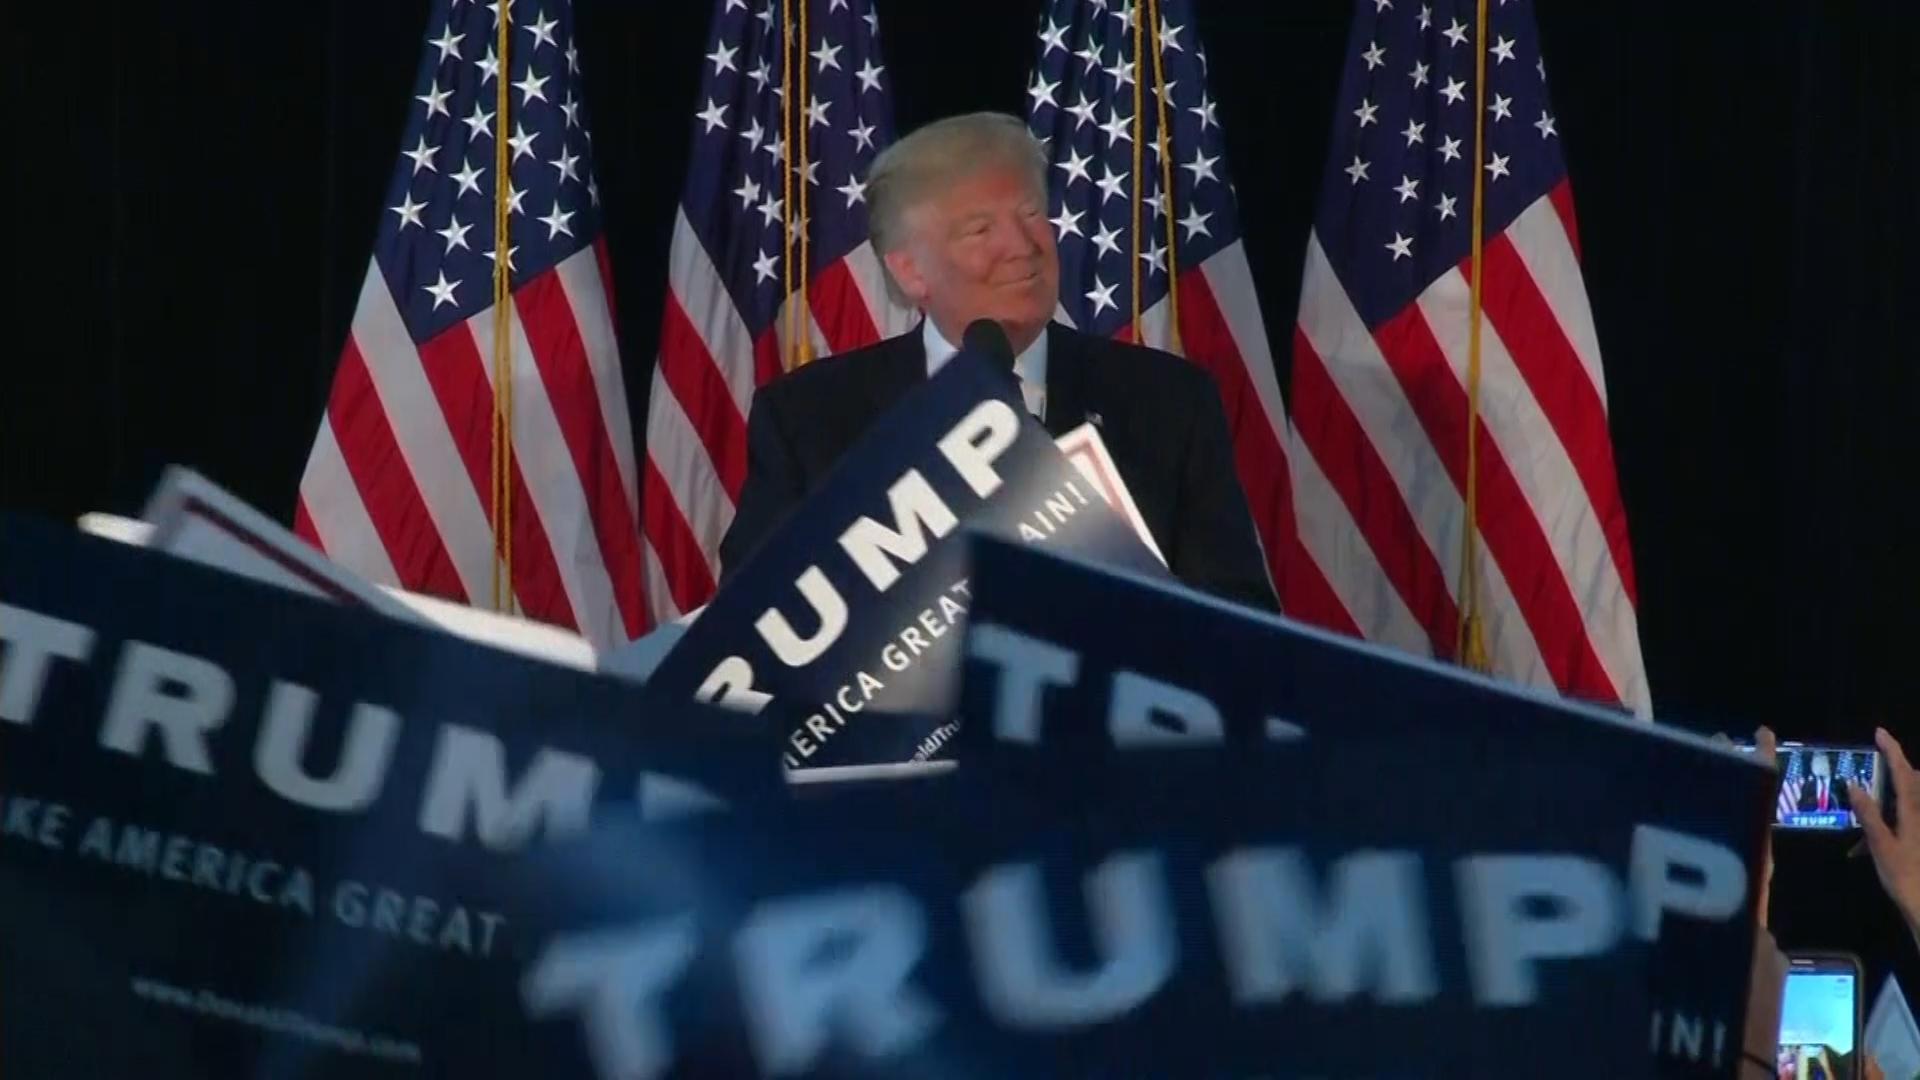 Donald Trump_1462407409857.jpg